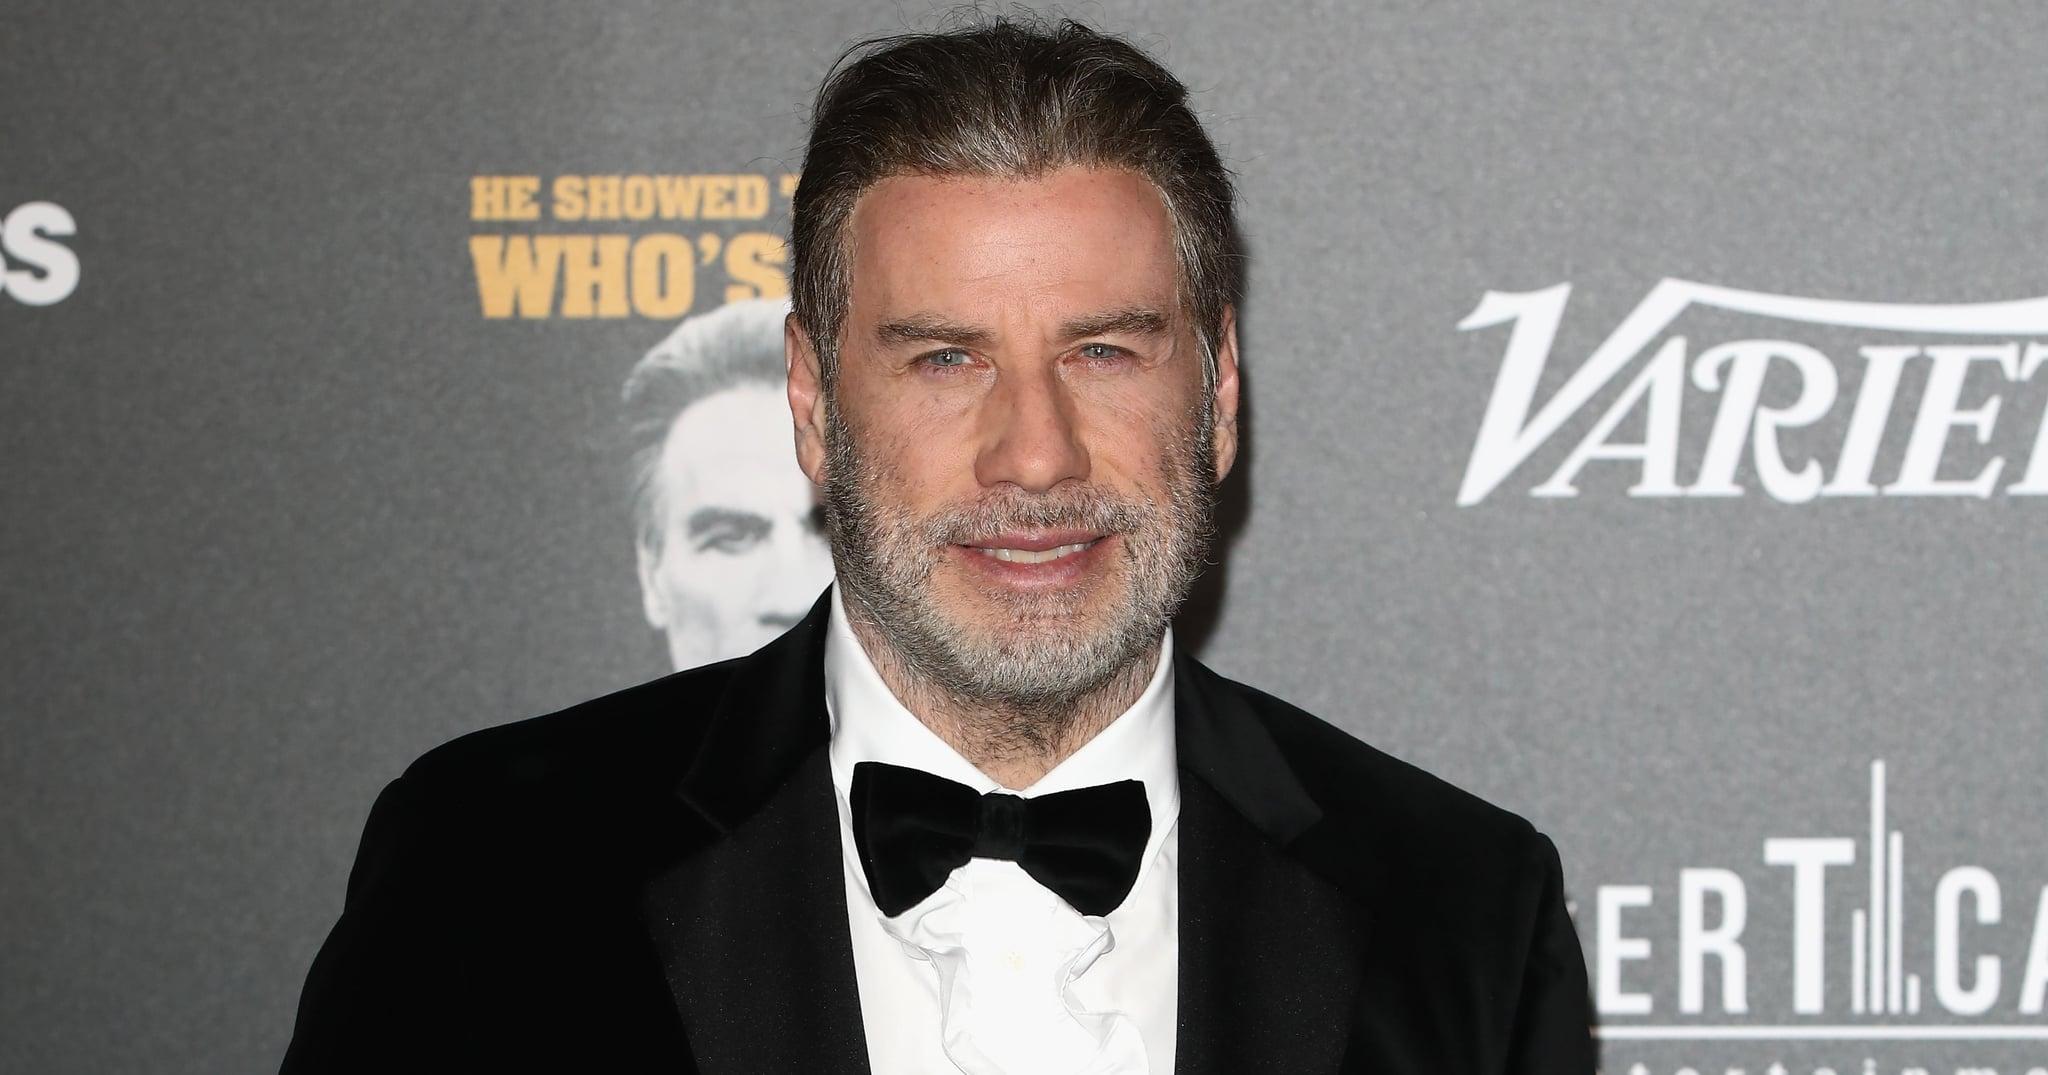 John Travolta Is Working on a Secret Project in Miami